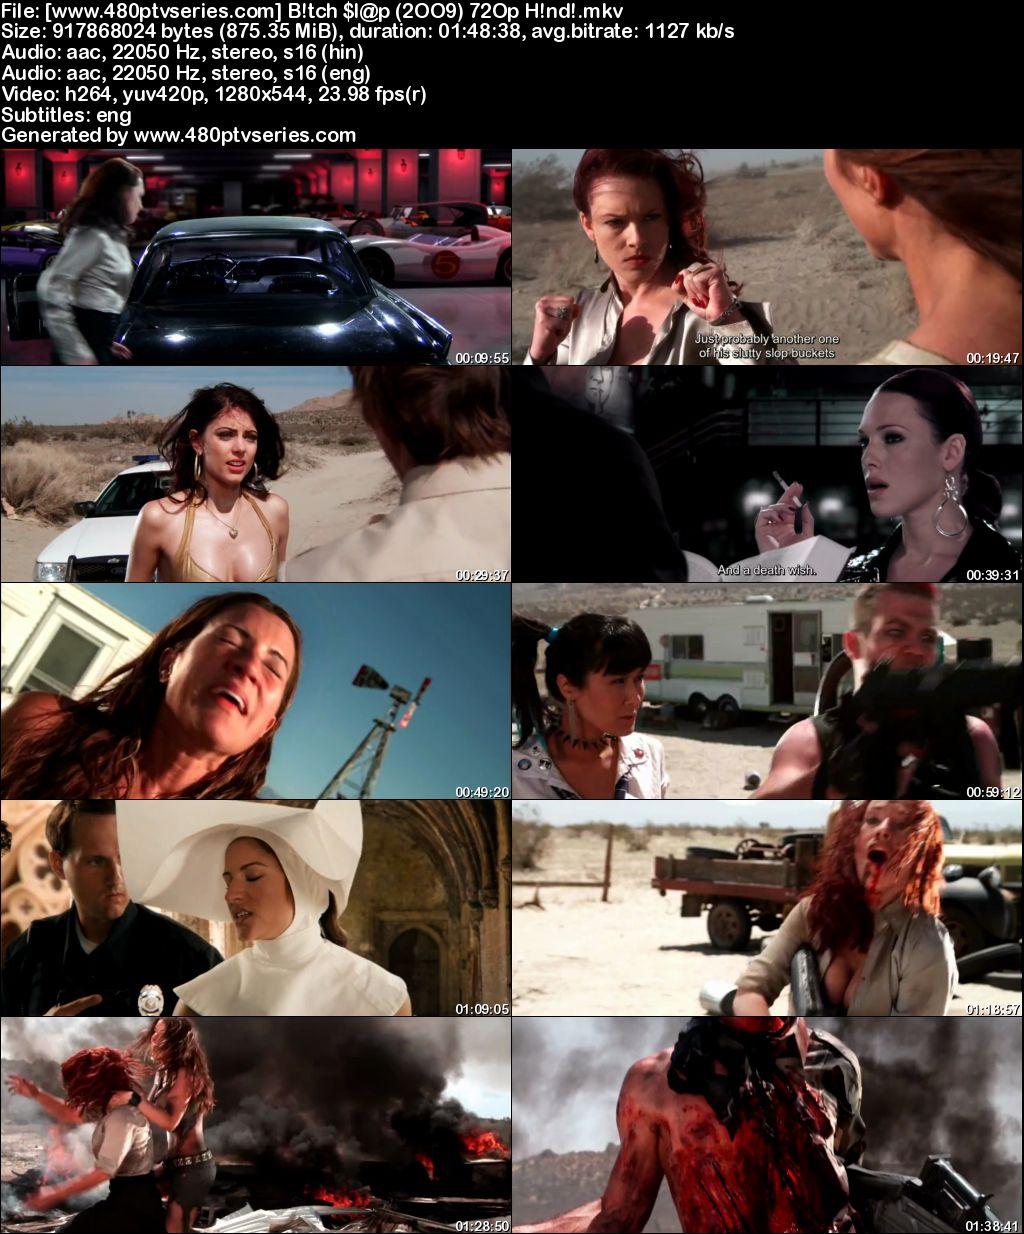 Watch Online Free Bitch Slap (2009) Full Hindi Dual Audio Movie Download 480p 720p Bluray